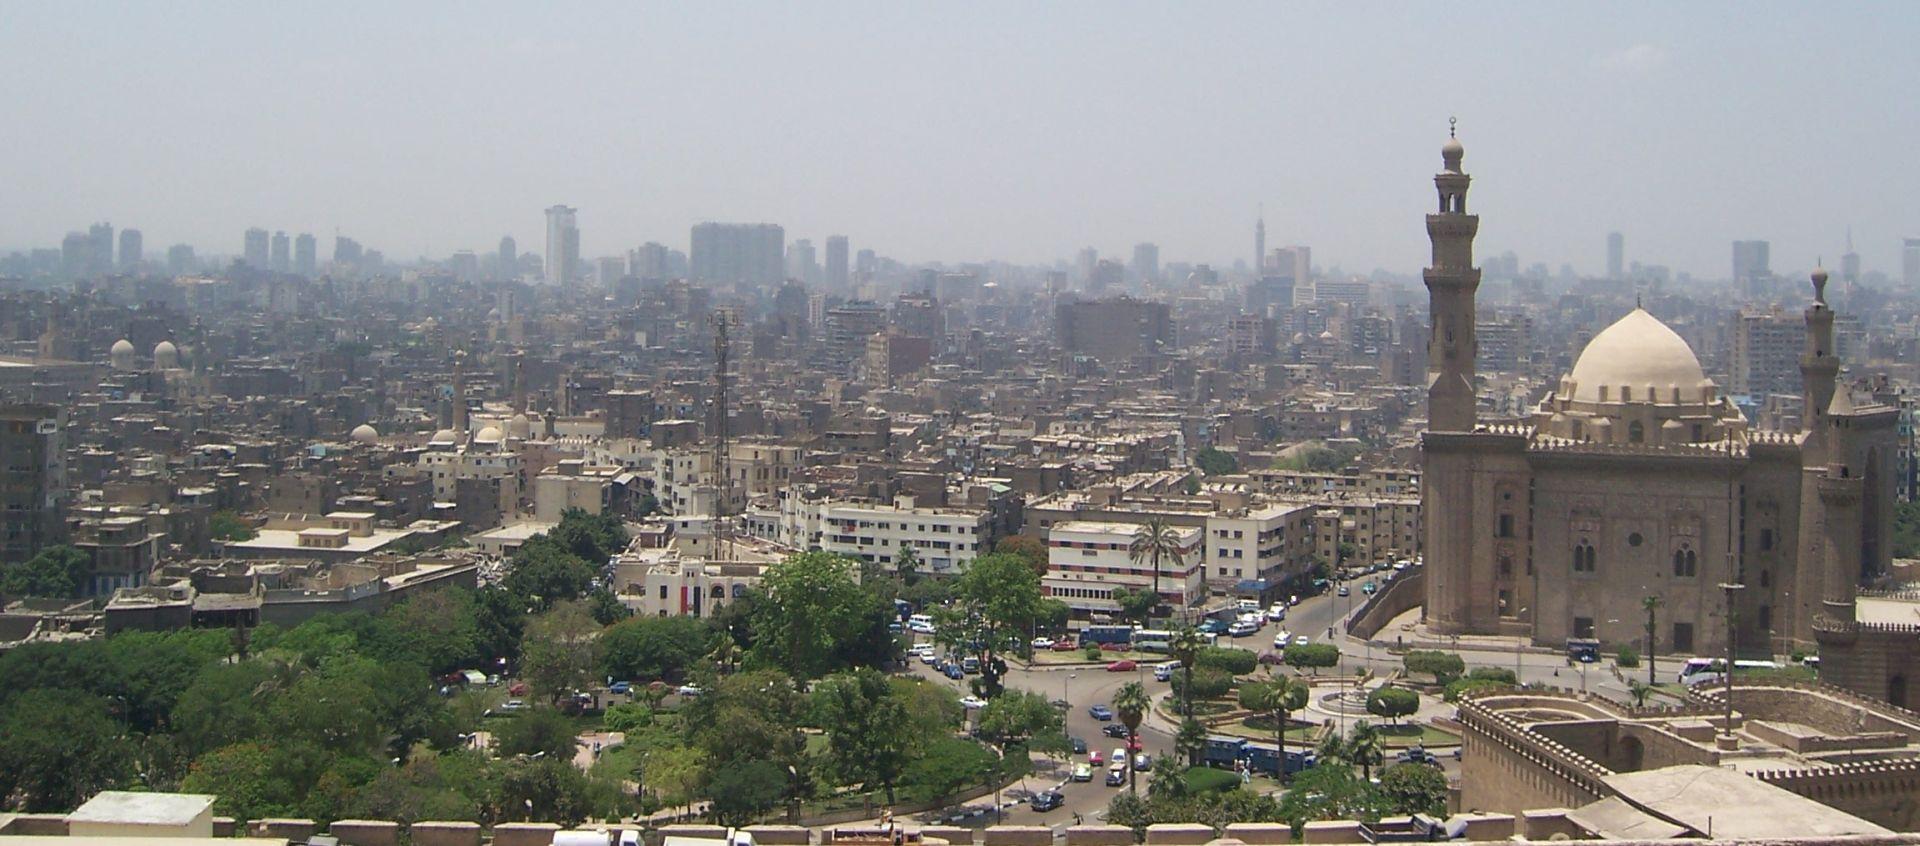 KAIRO Više od 20 ljudi poginulo u eksploziji kraj koptske katedrale